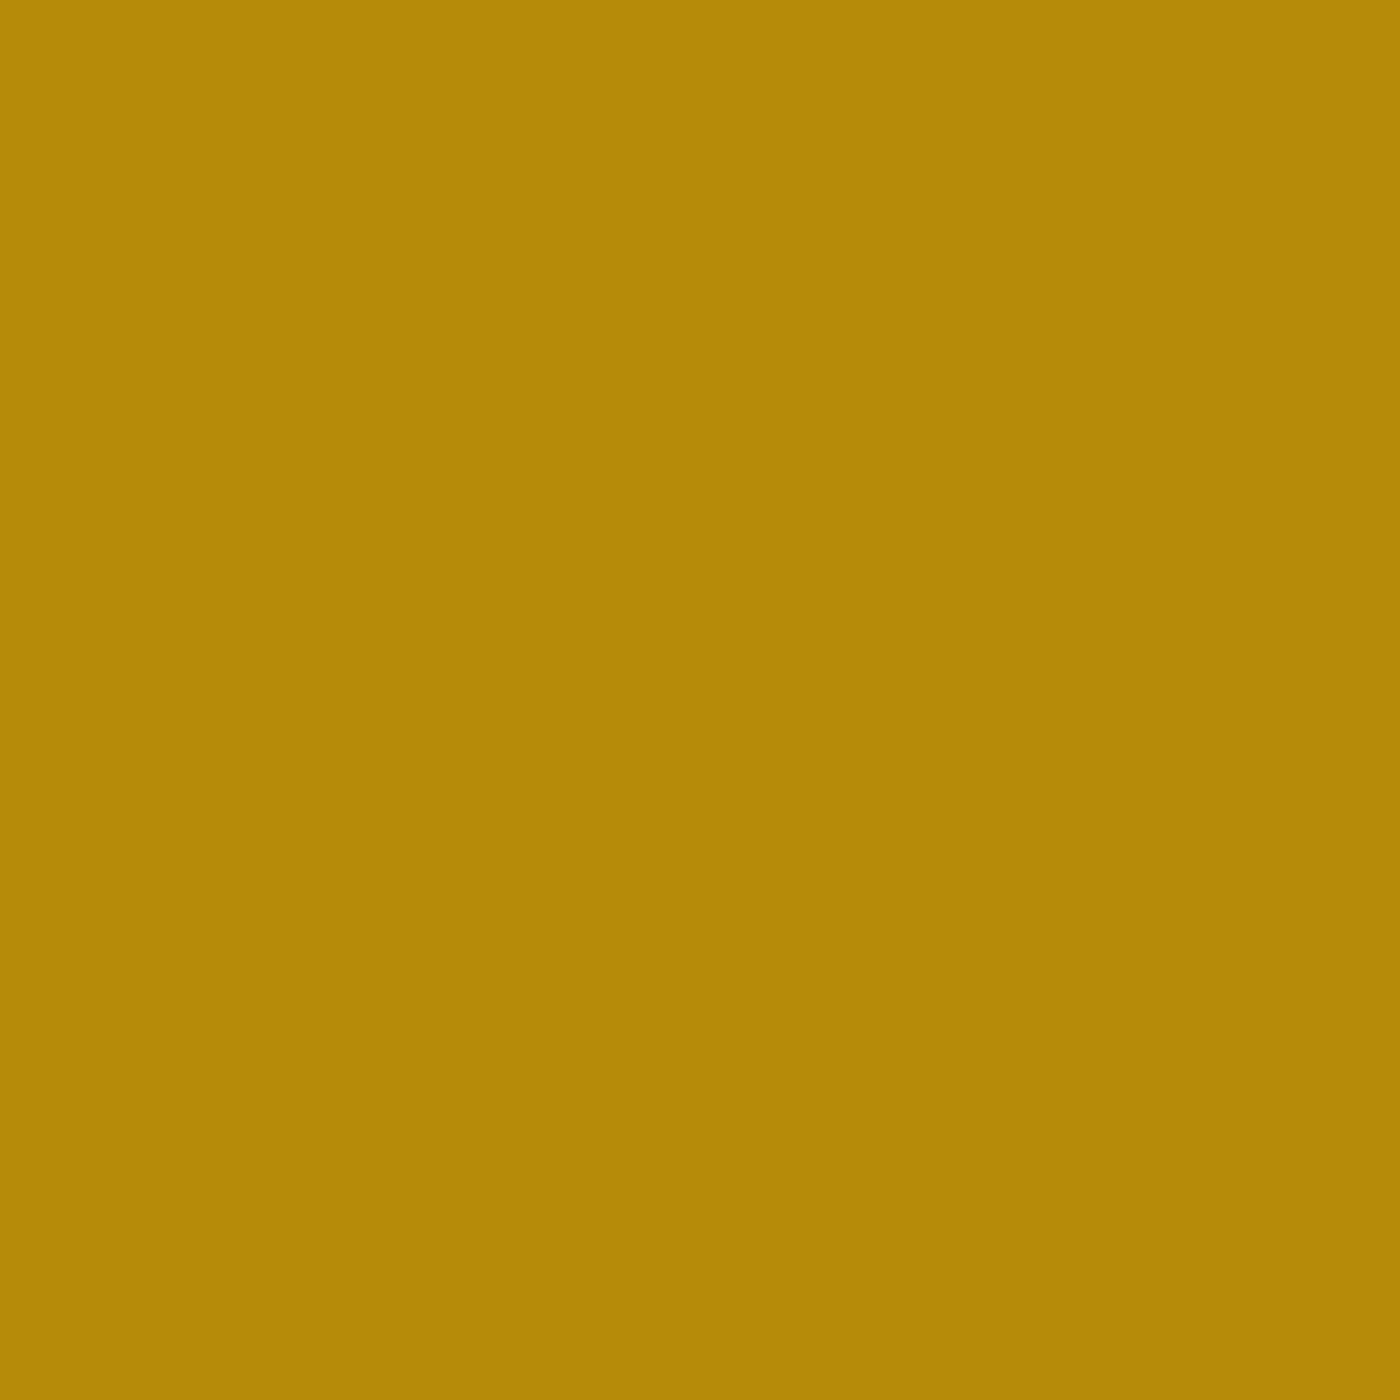 Oracal 651 Vinyl Roll 12'' x 50 yard (150 feet) (Metallic Gold)